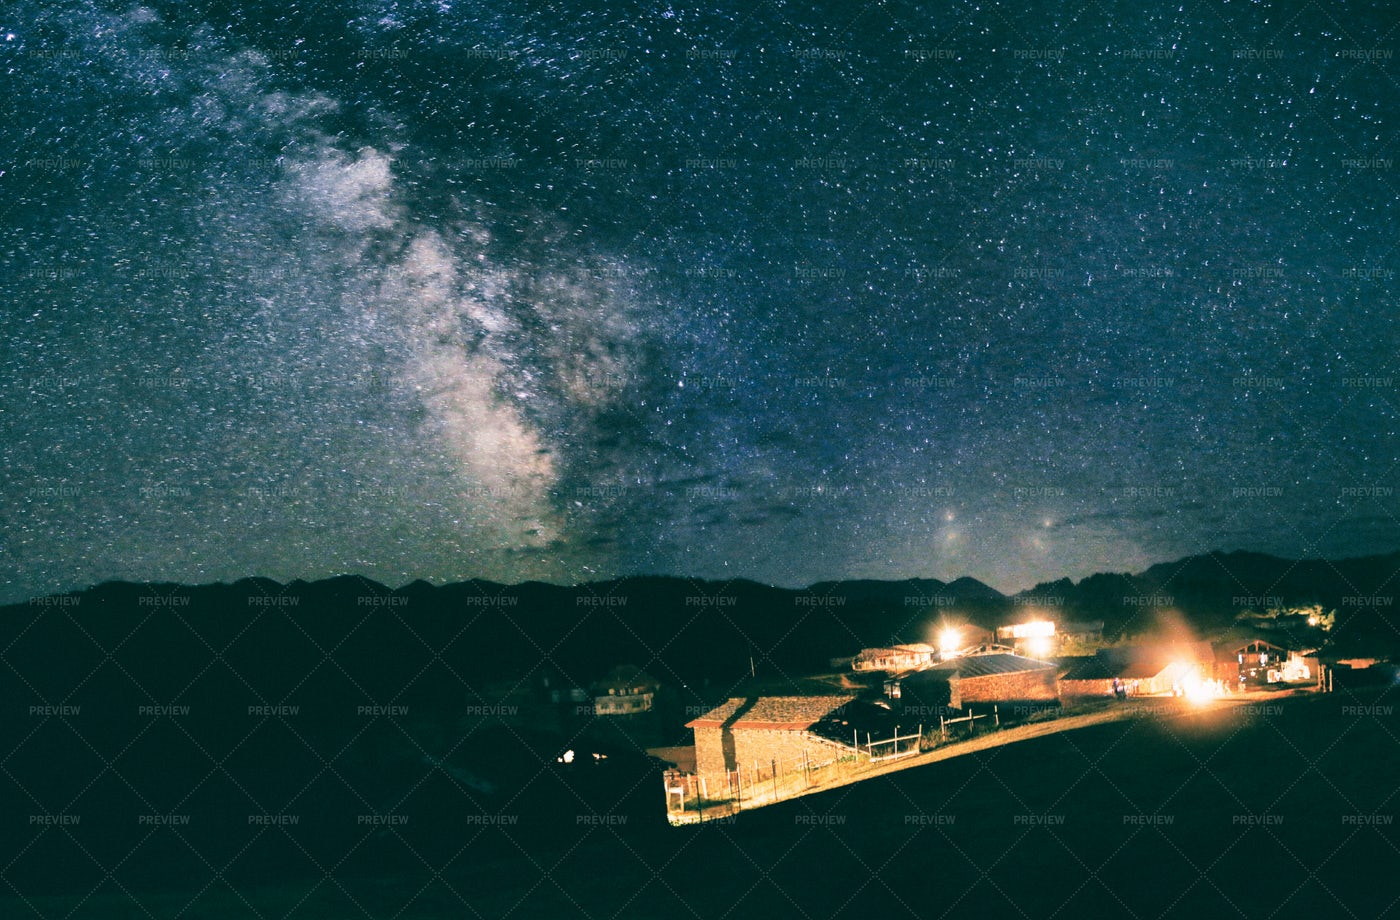 Milkyway In High Mountain: Stock Photos